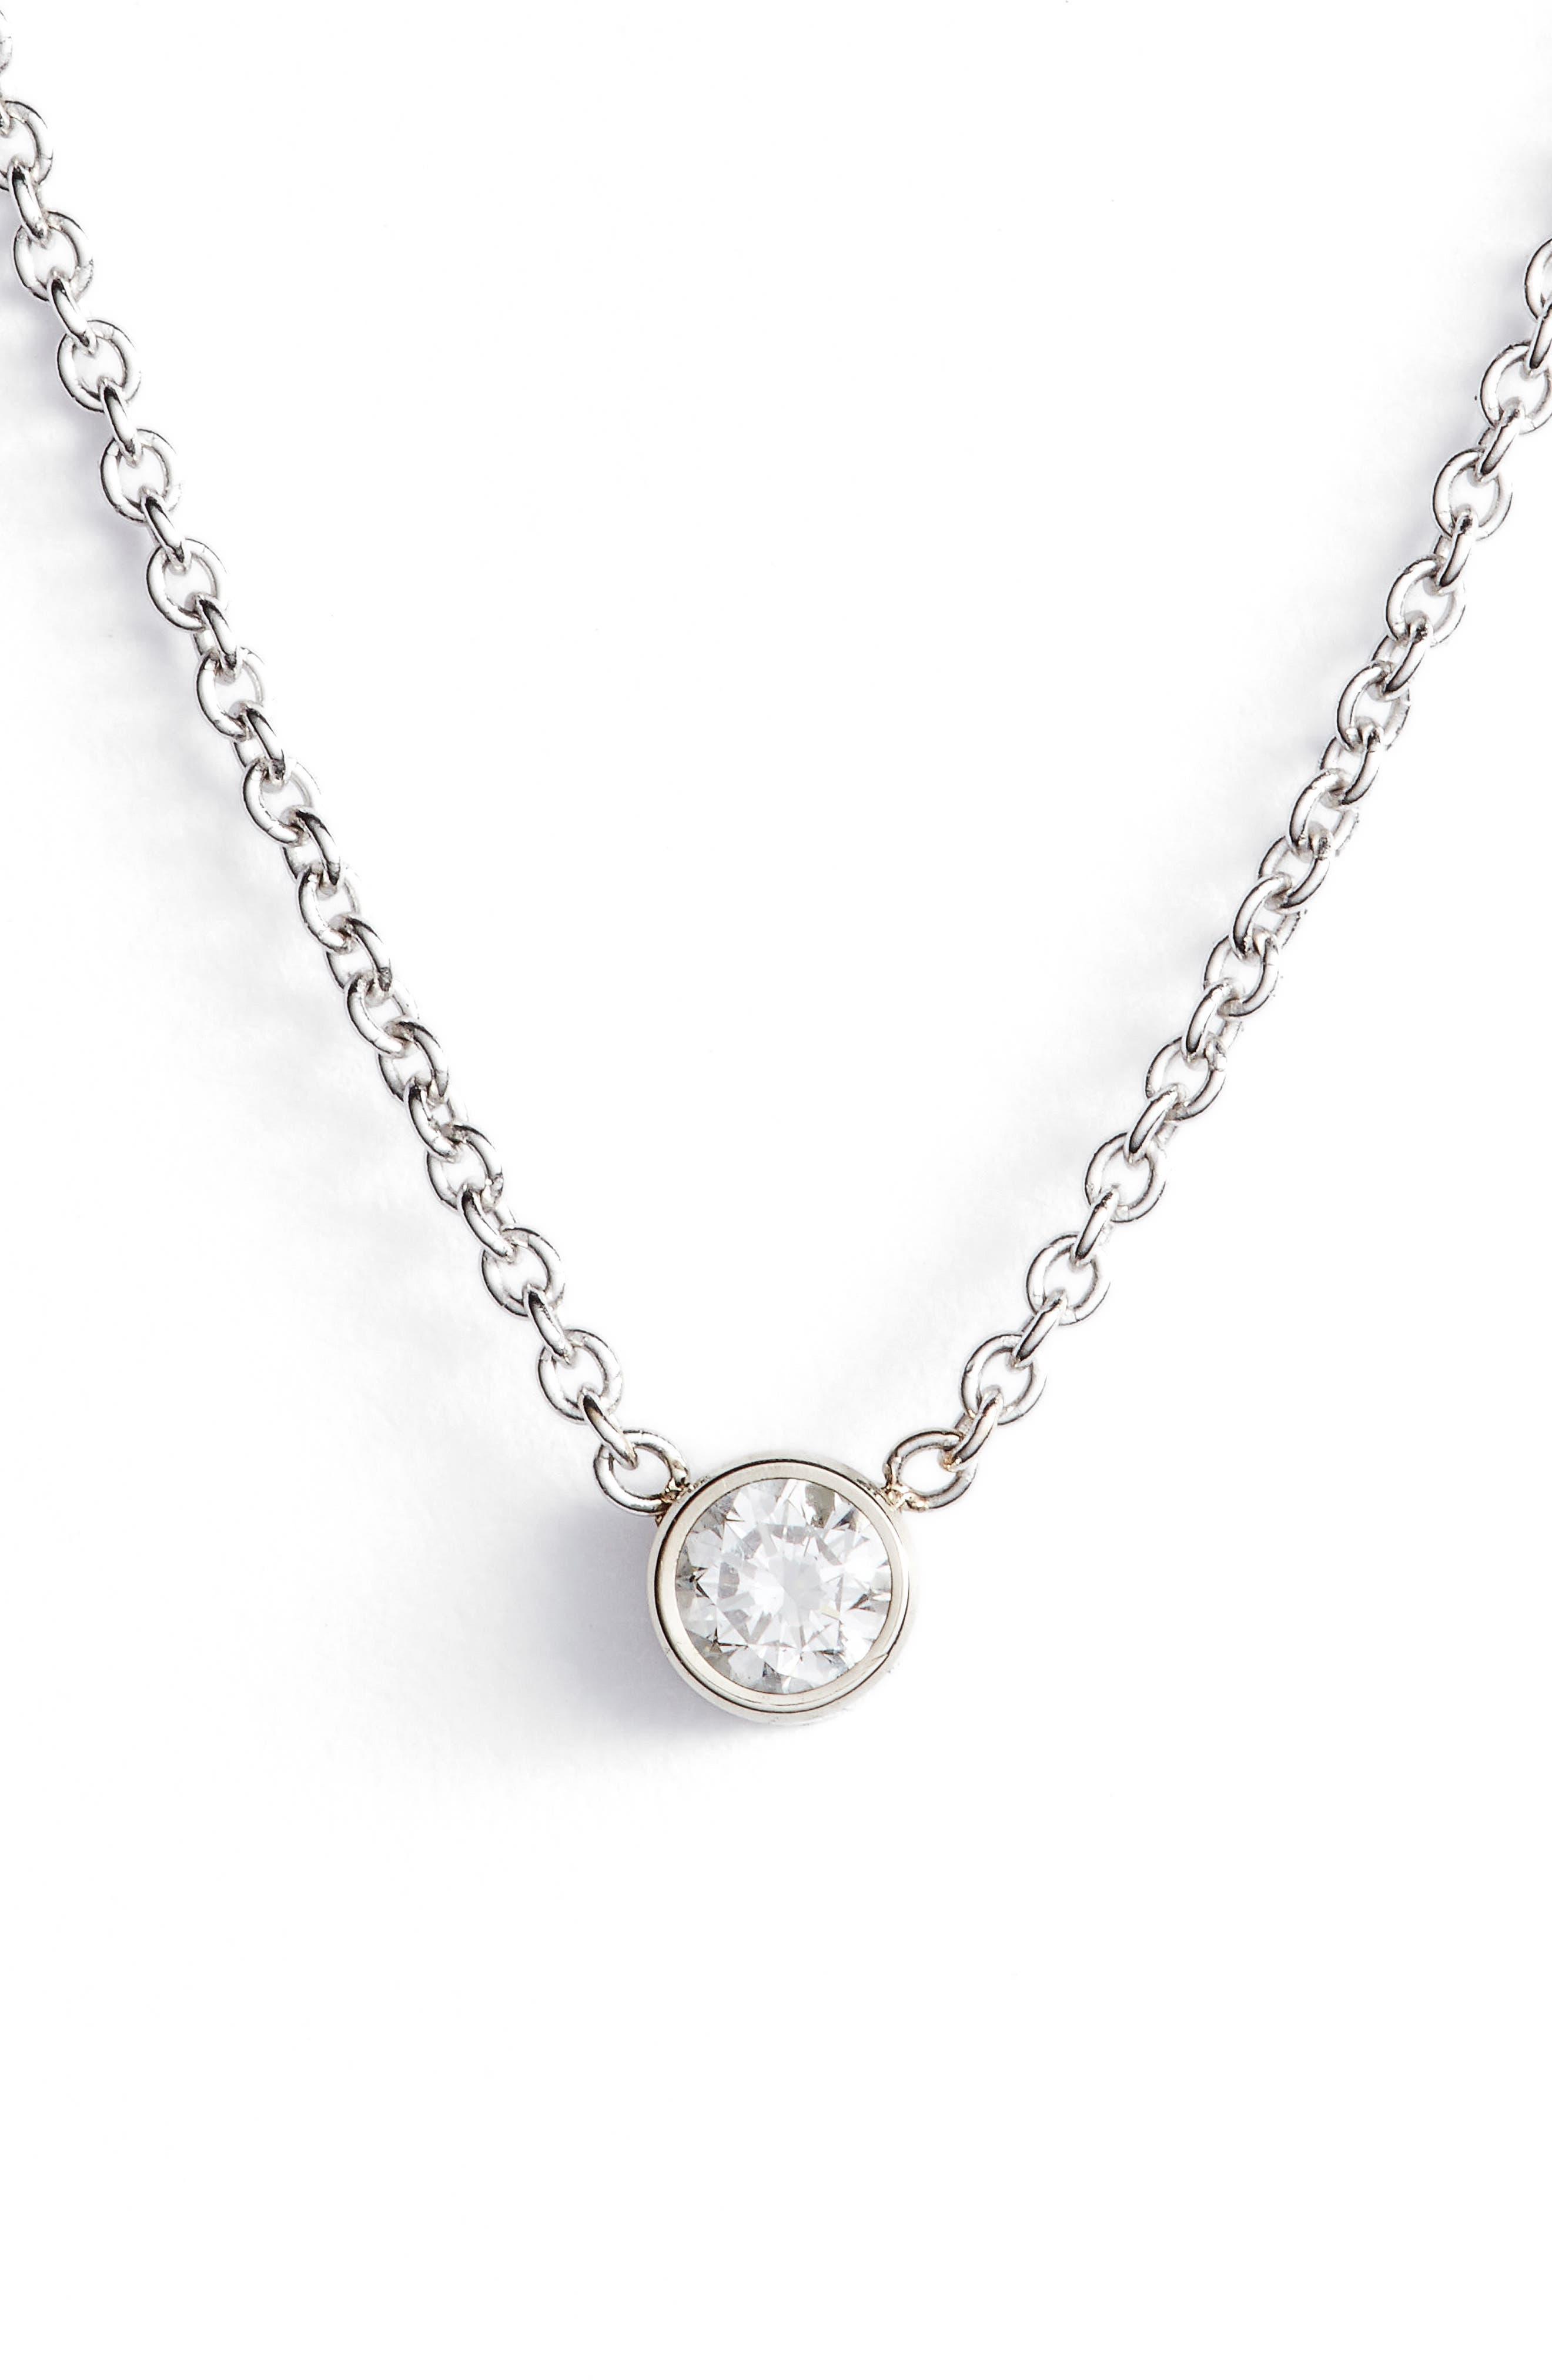 Diamond Bezel Pendant Necklace,                             Main thumbnail 1, color,                             WHITE GOLD